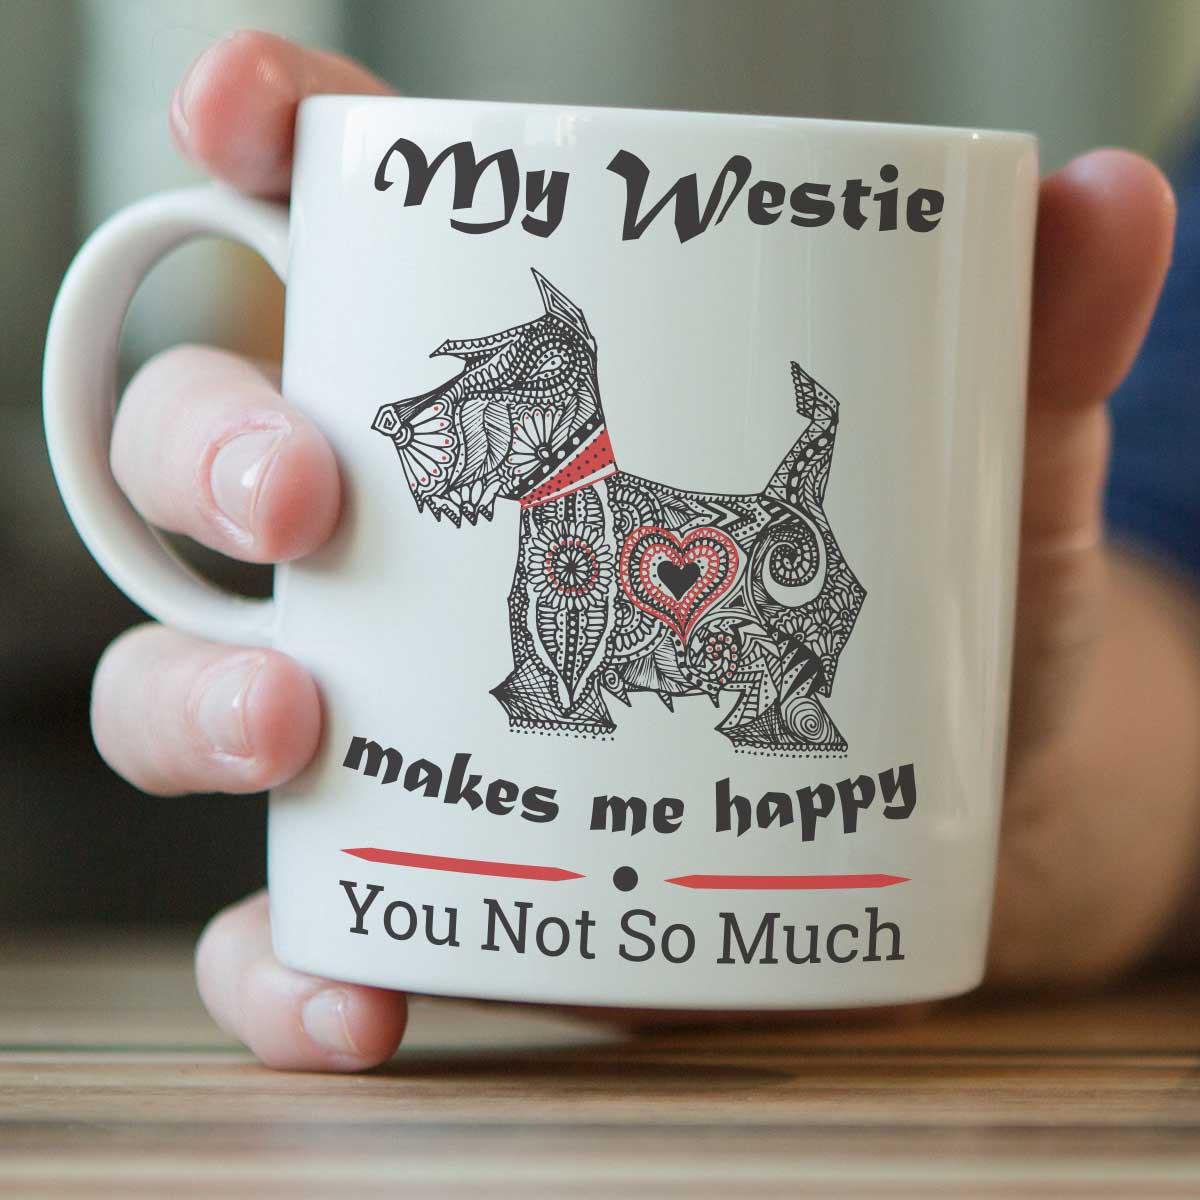 My Westie Makes Me Happy Mug